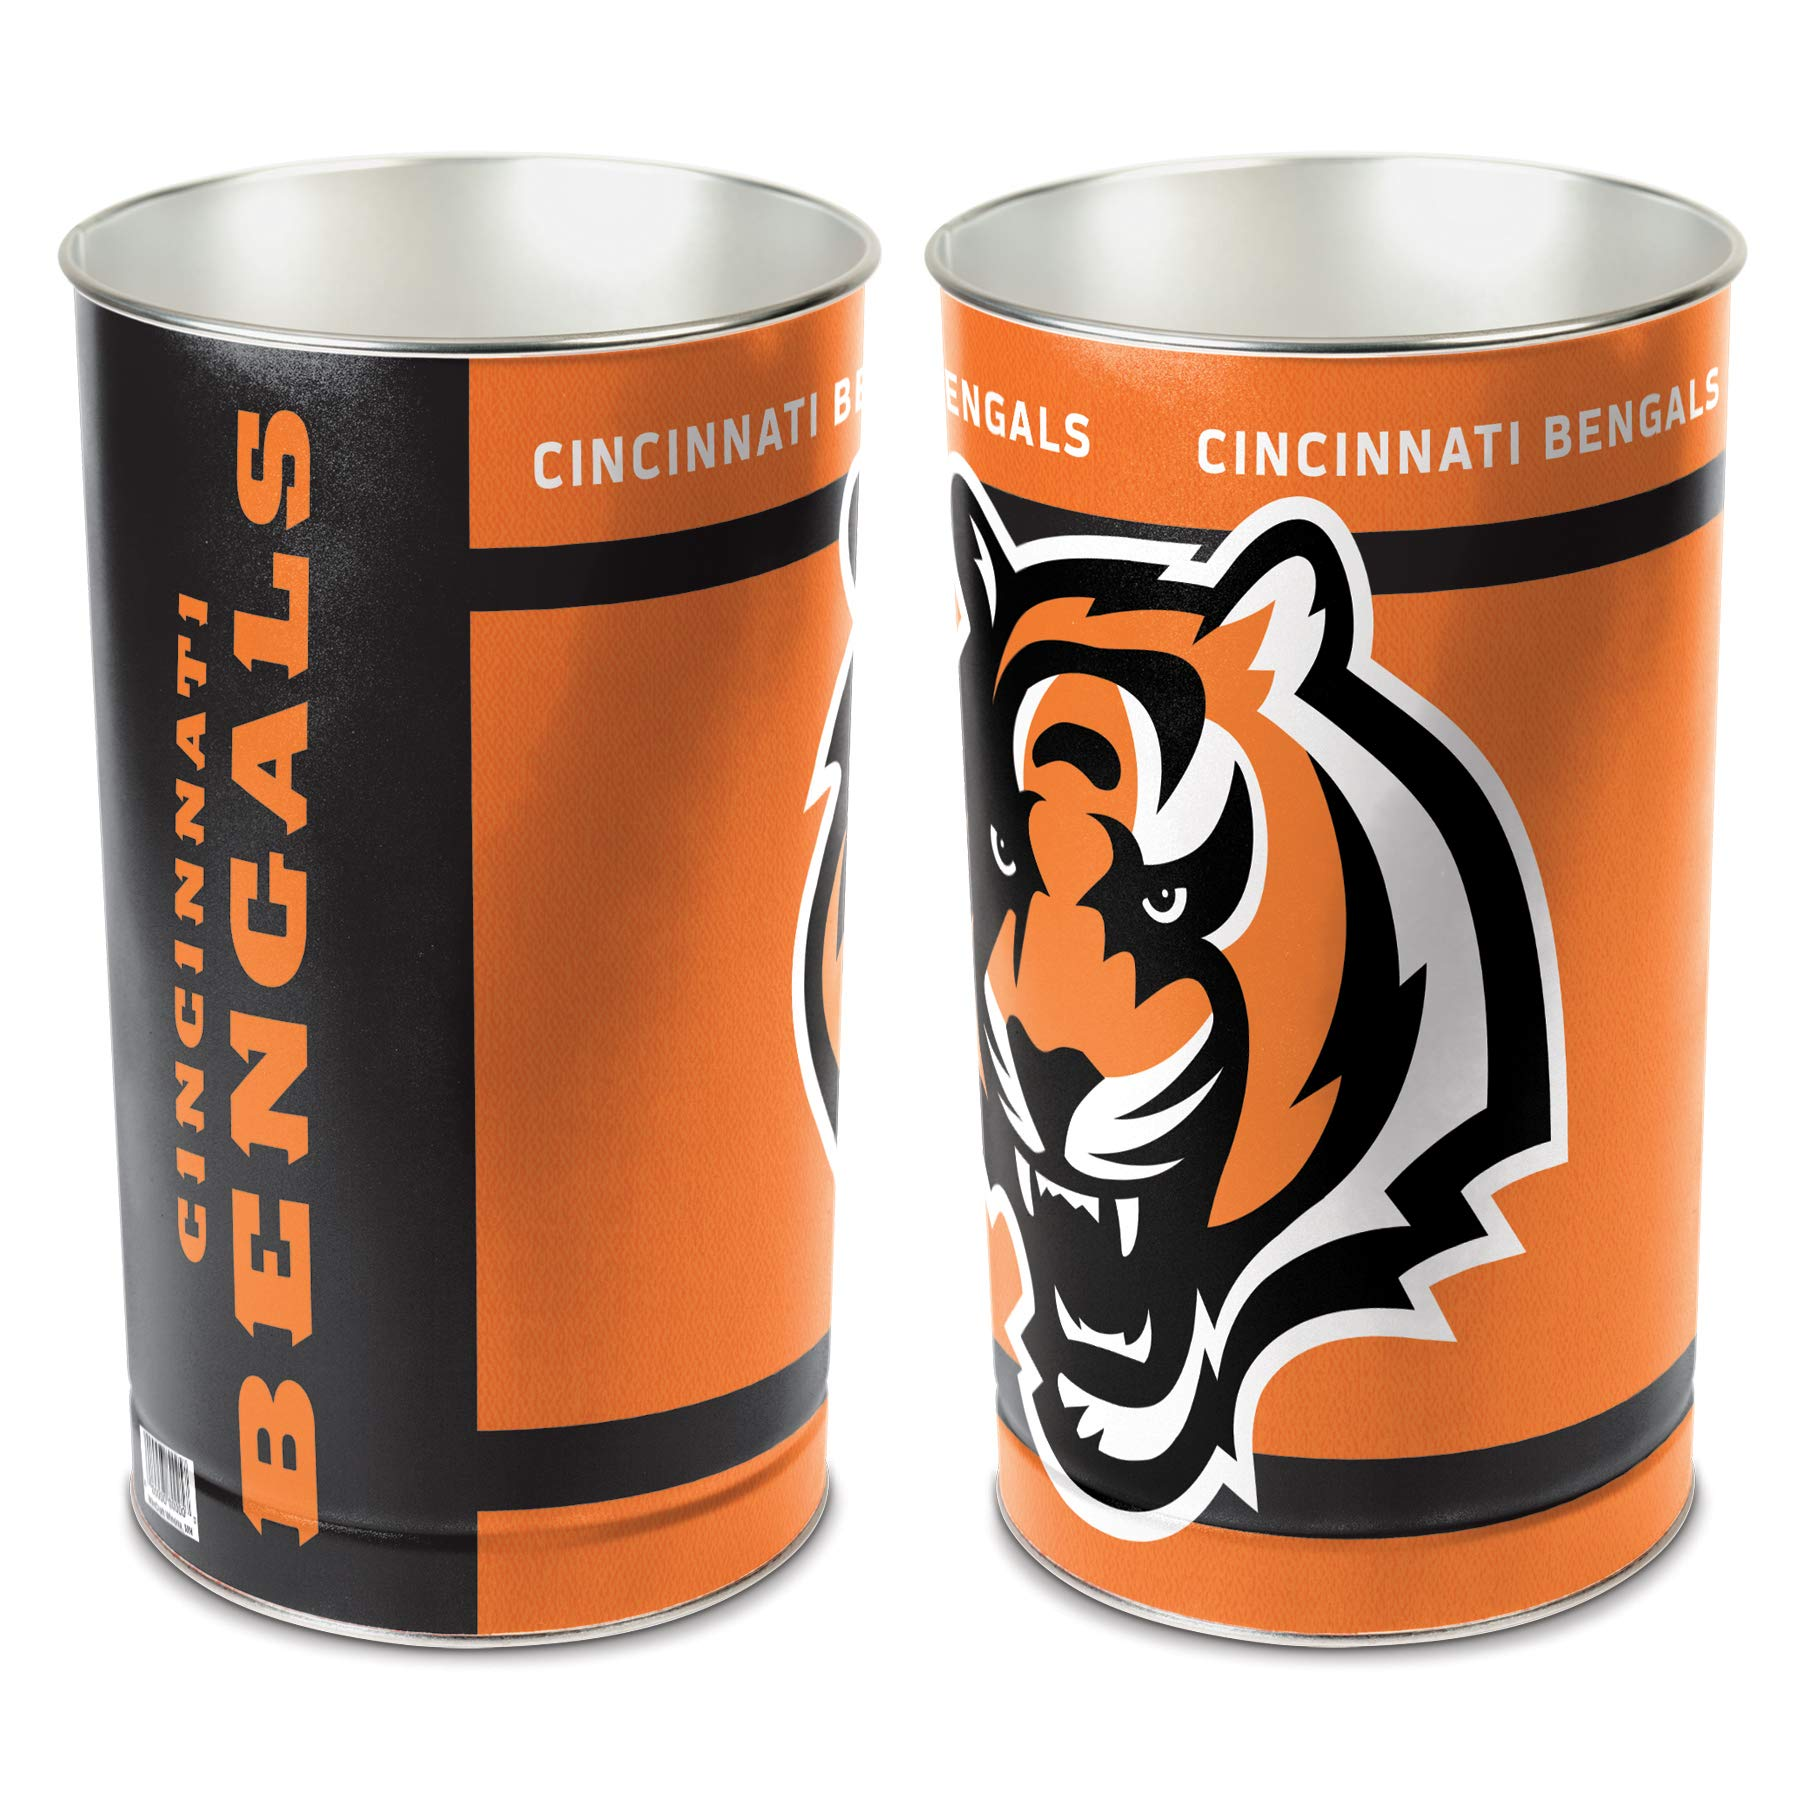 Cincinnati Bengals Wastebasket